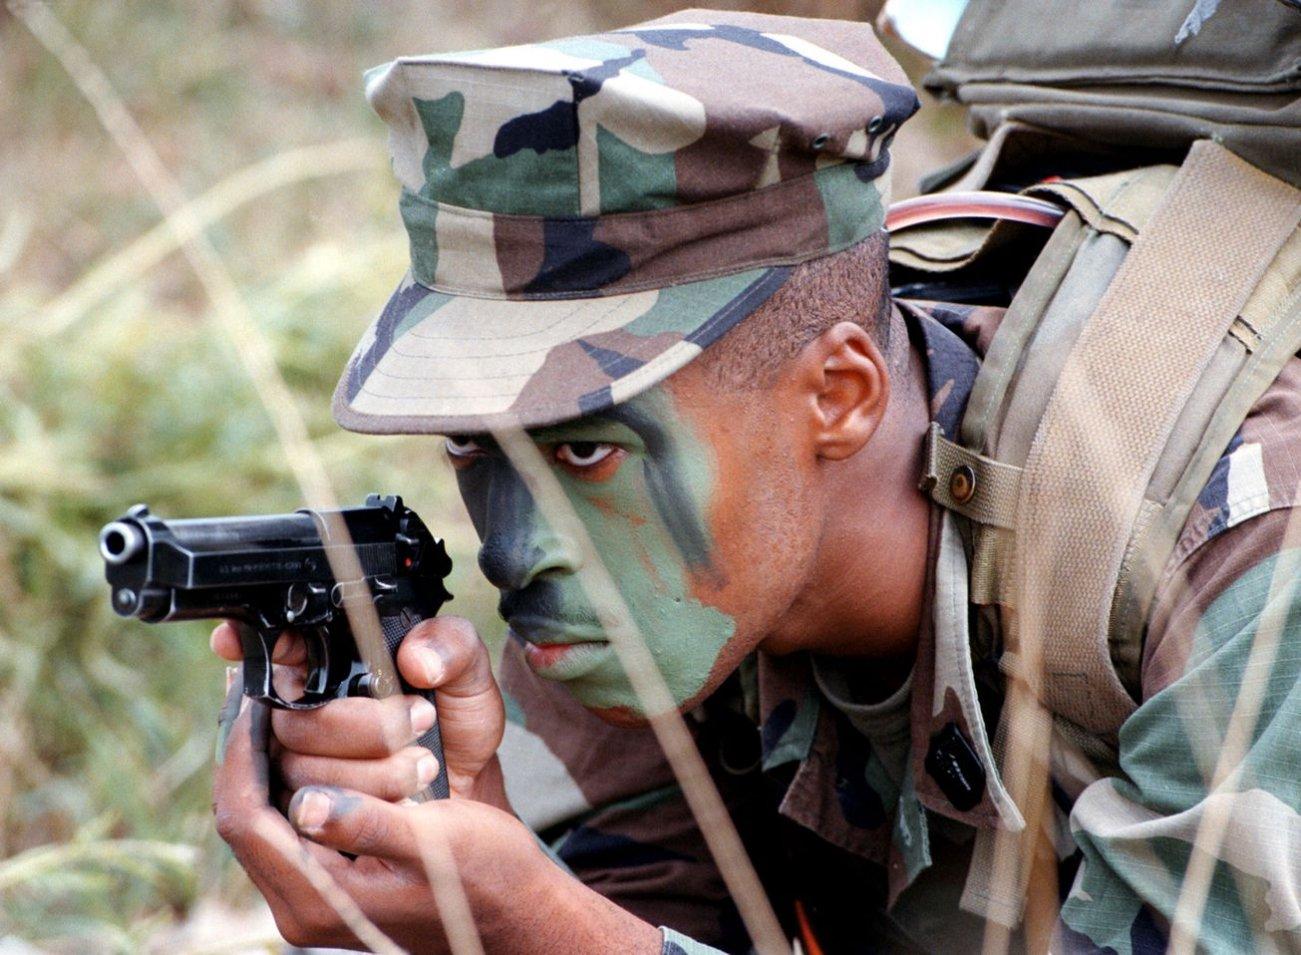 Marines to Receive Modular Handgun—First New Pistol in 35 Years